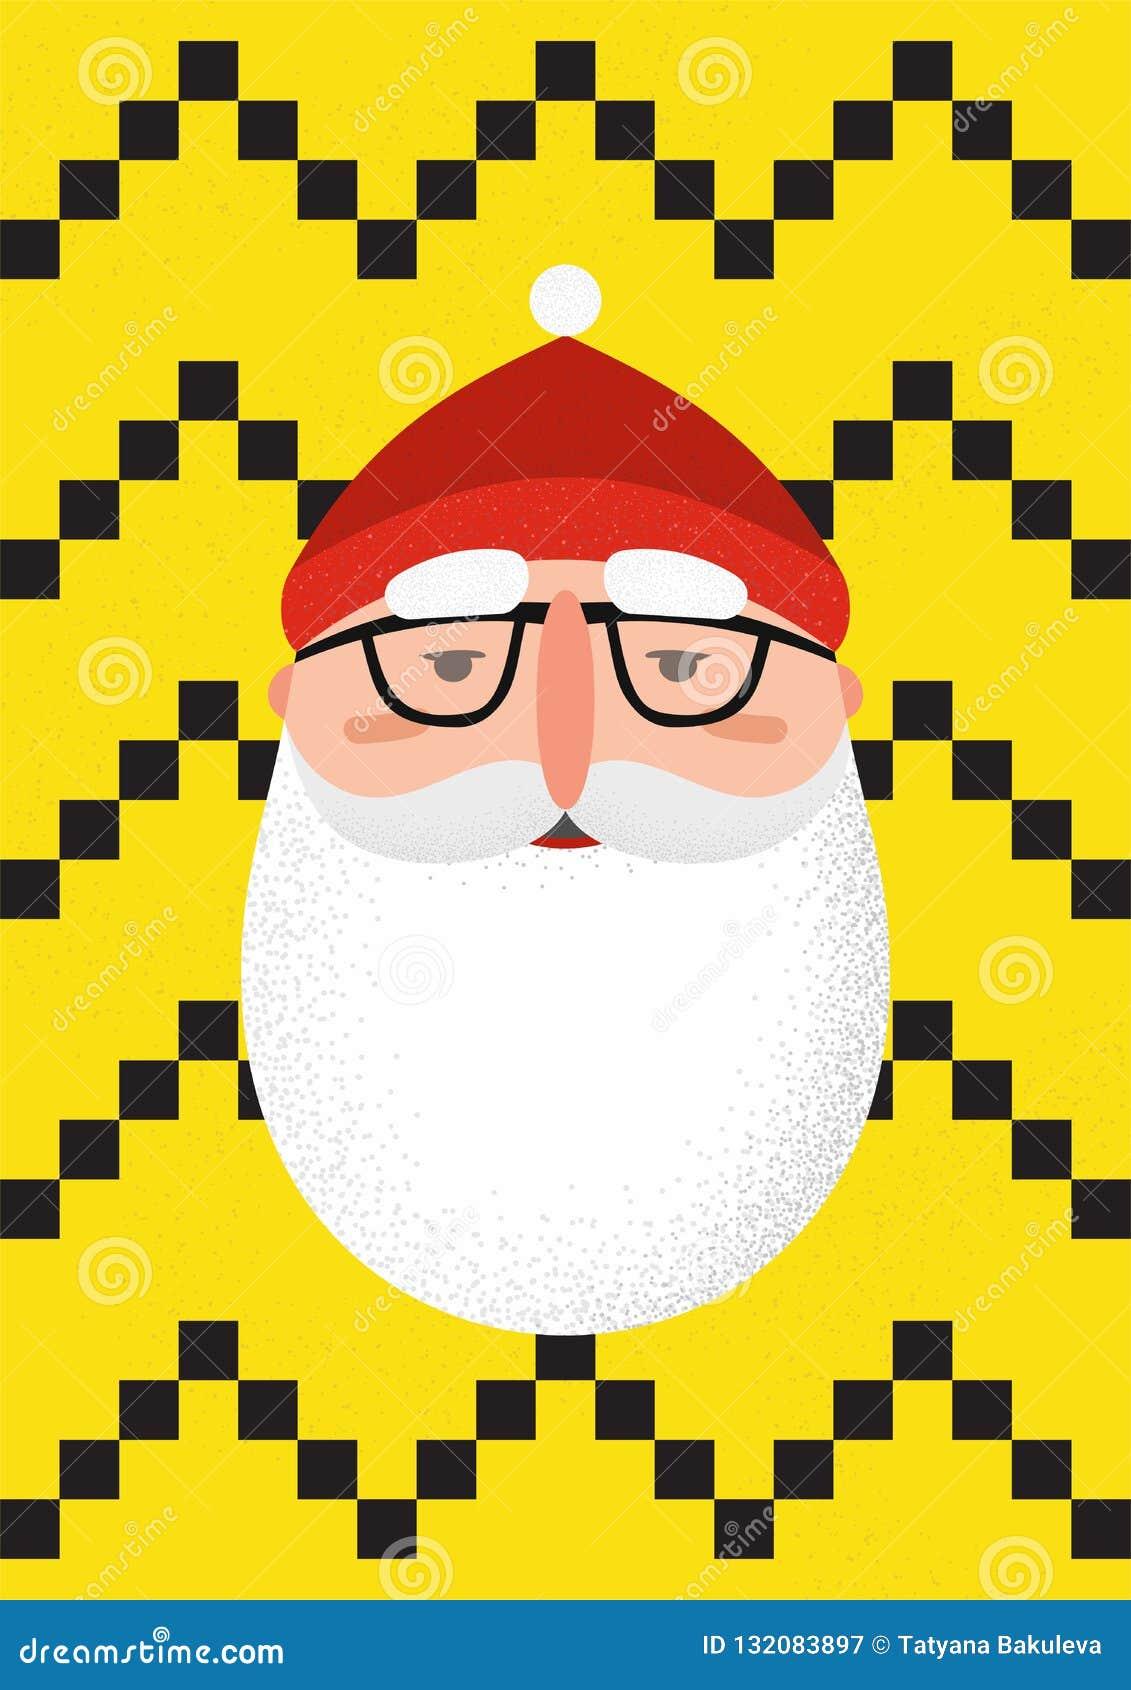 dd2c60835ed Bearded Hipster Santa Claus Stock Vector - Illustration of event ...